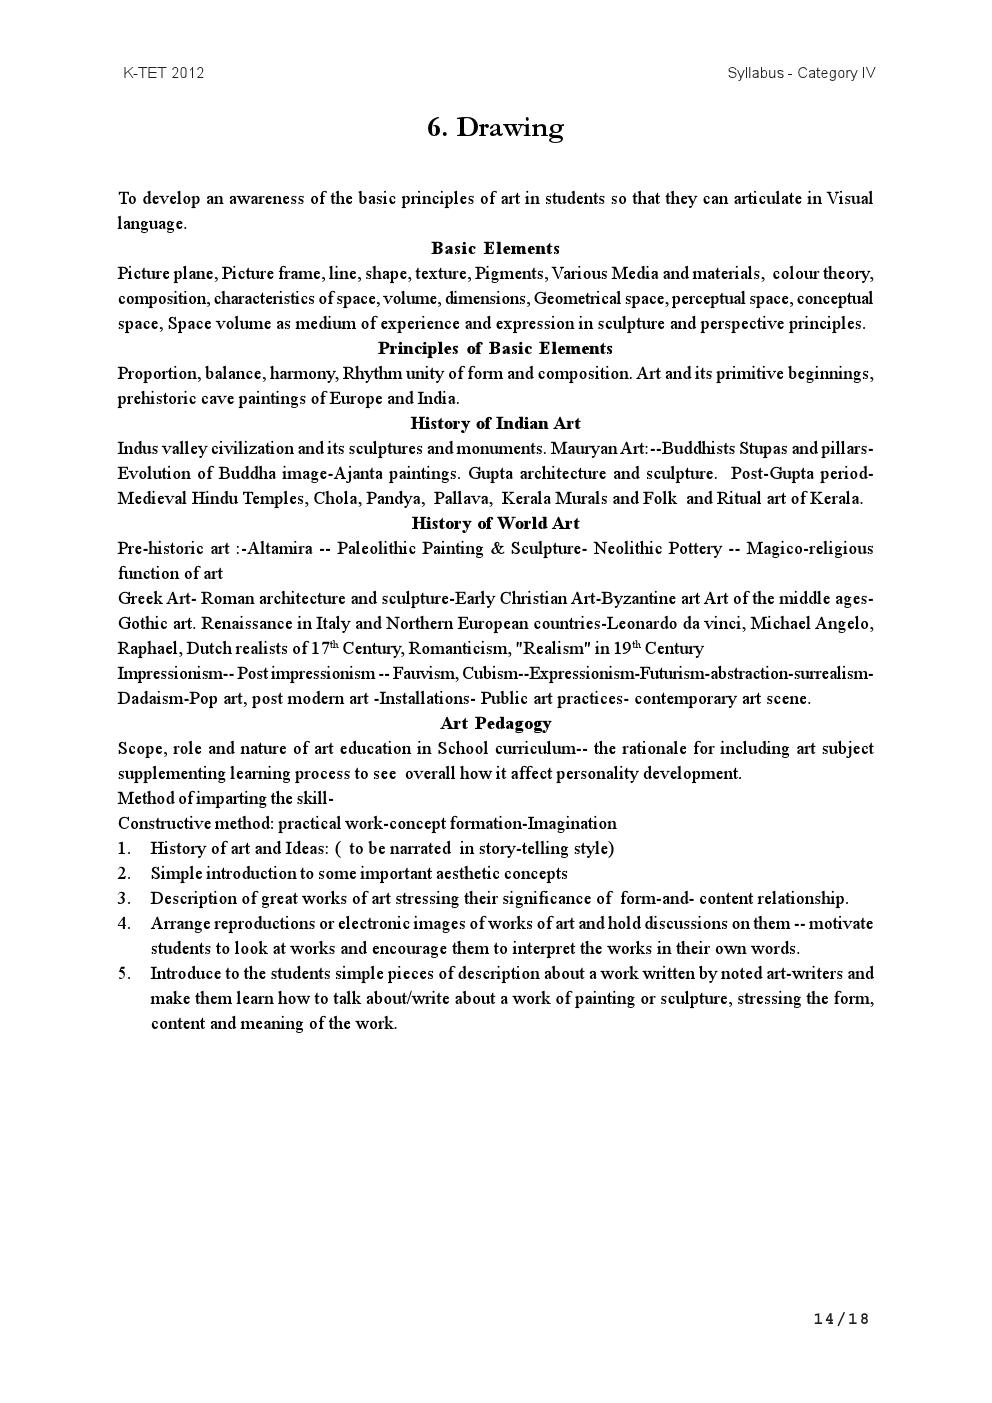 http://masterstudy.net/pdf/syllabus40014.jpg